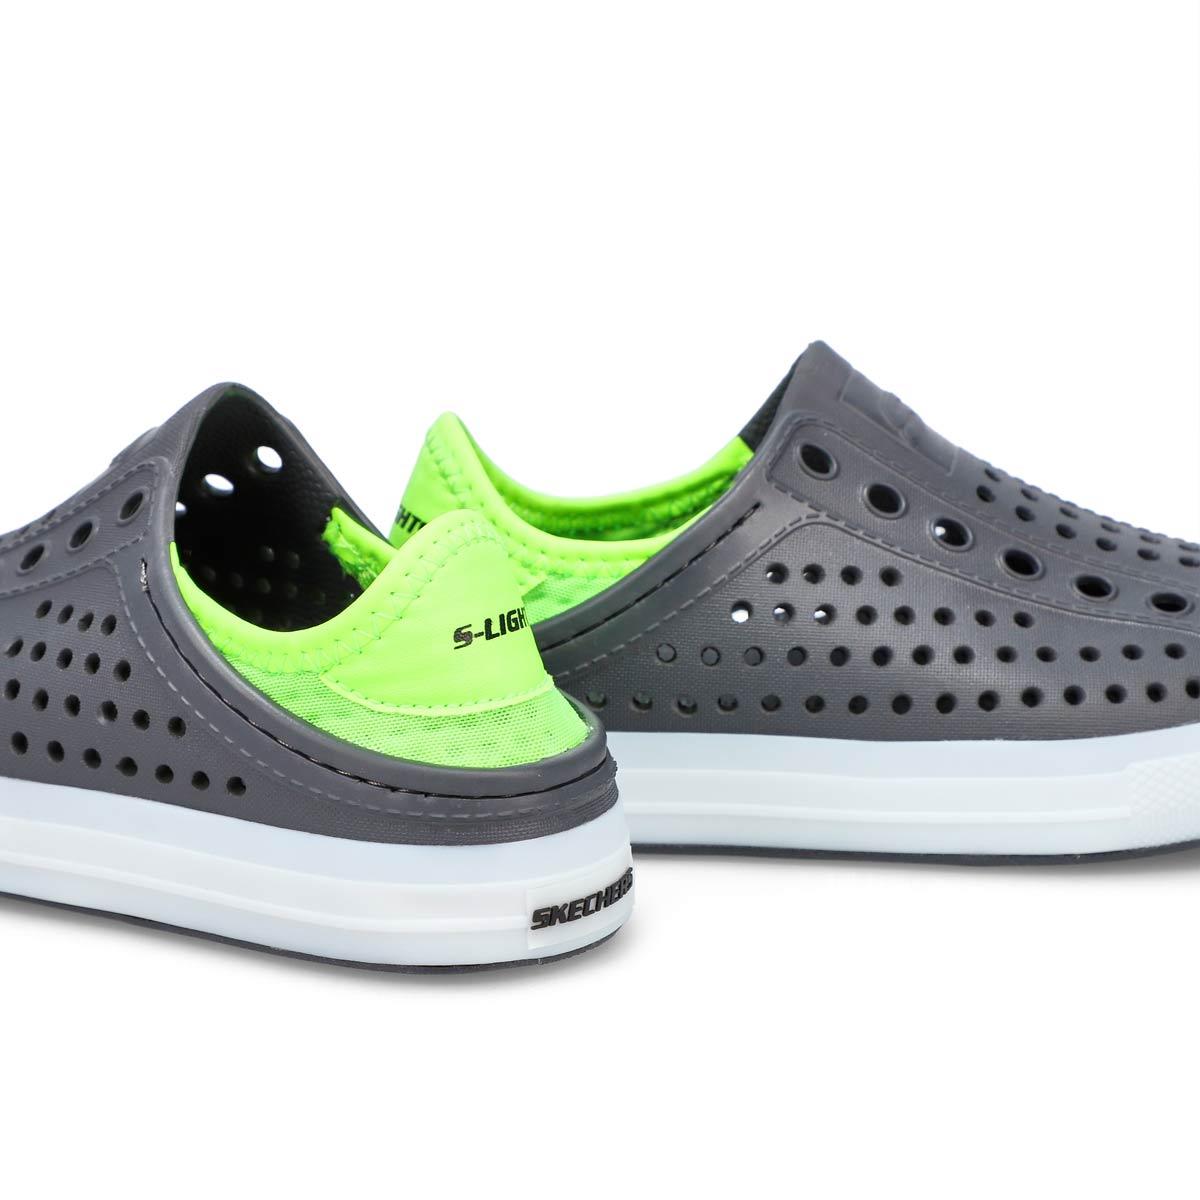 Boys' Guzman Flash Lighted Shoe - Charcoal/Lime